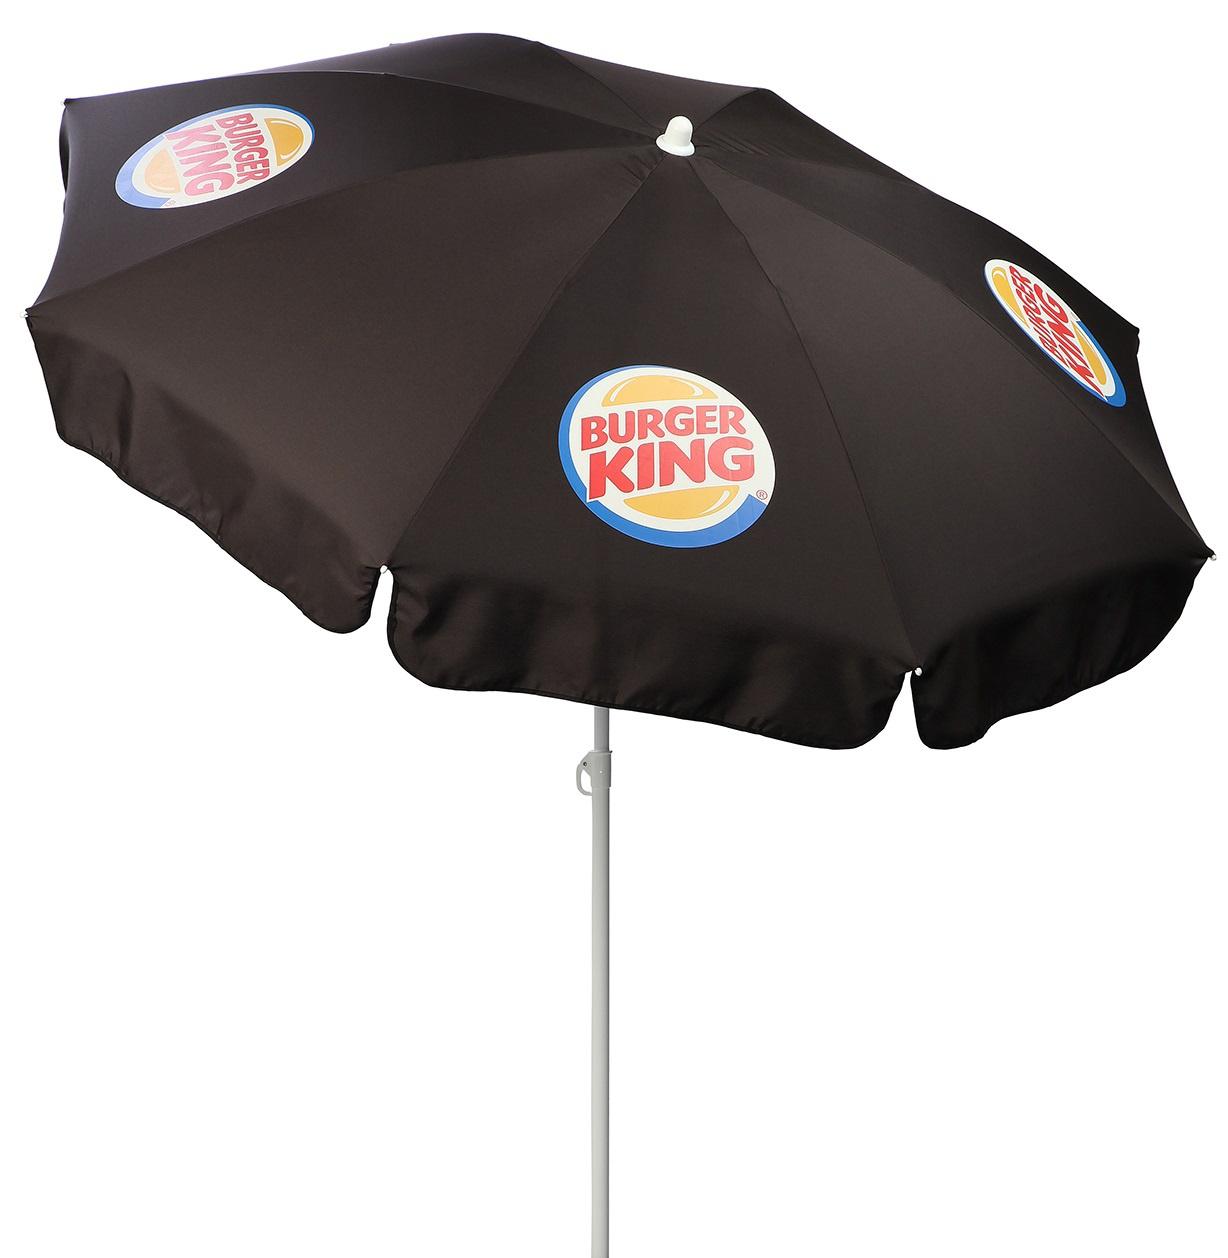 bespoke-parasol